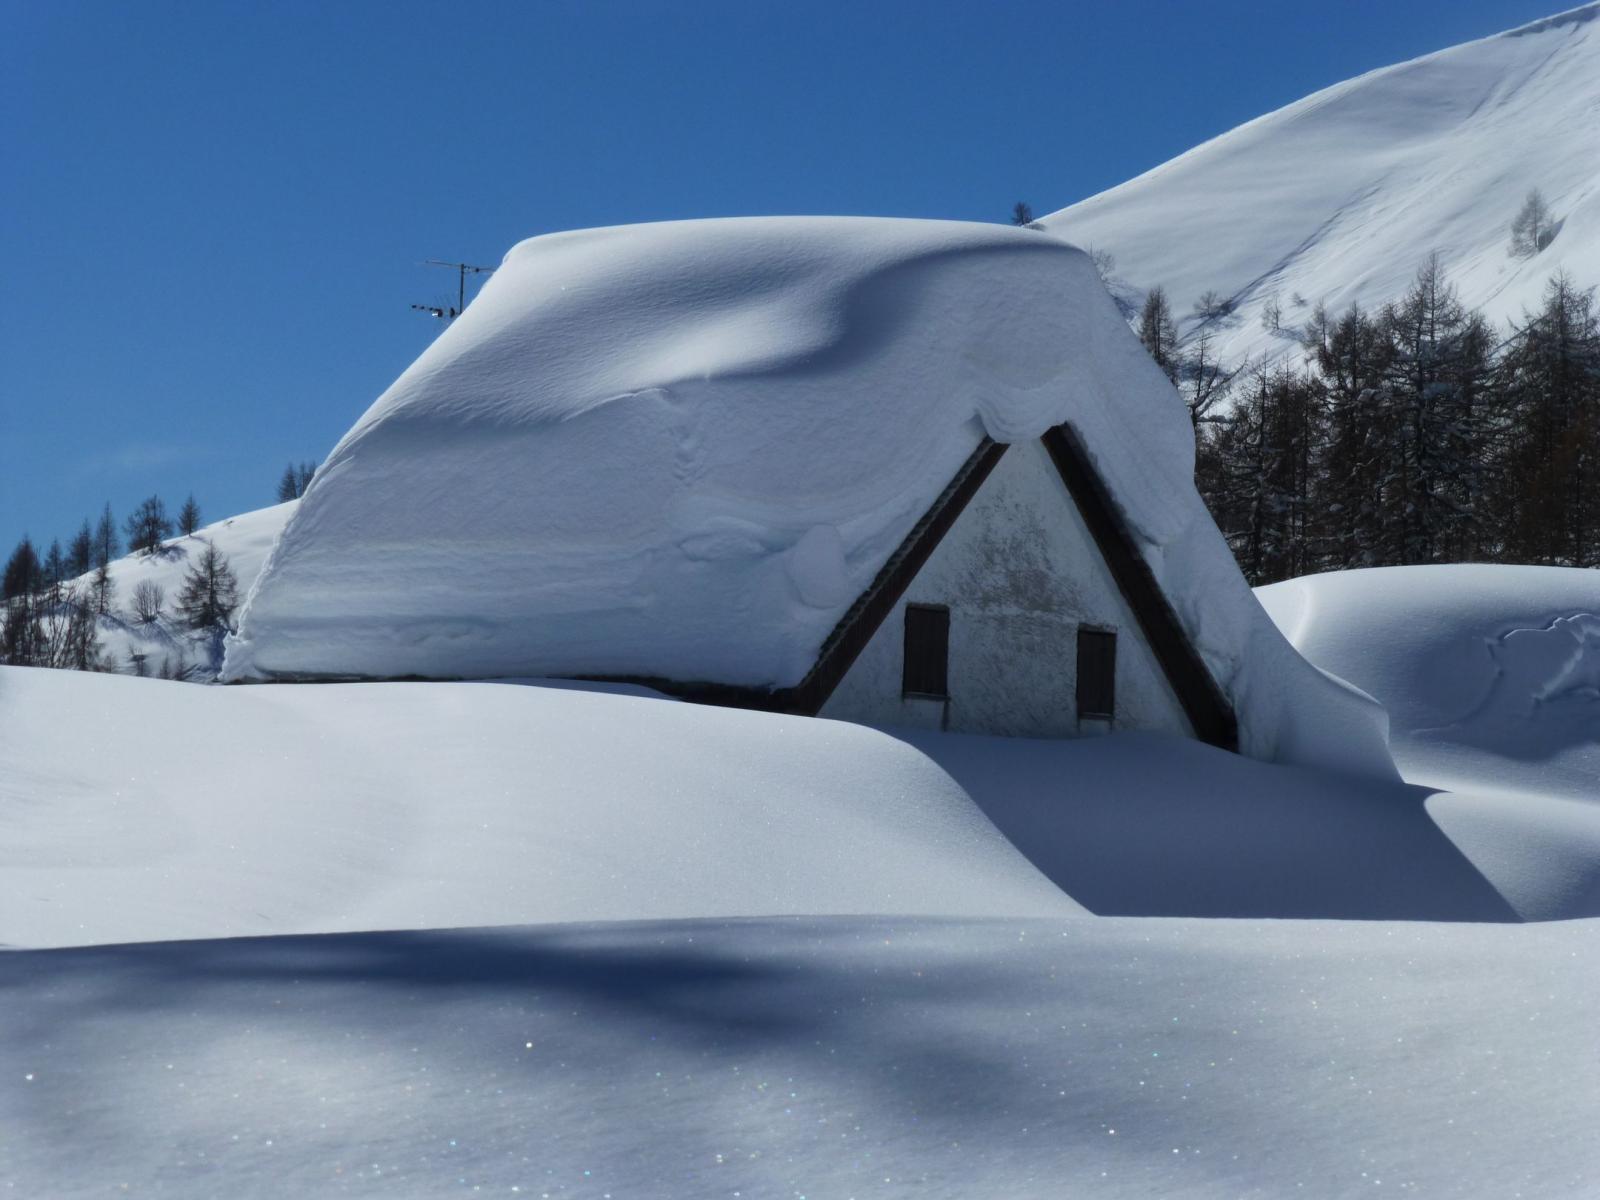 Arrivo all'Alpe